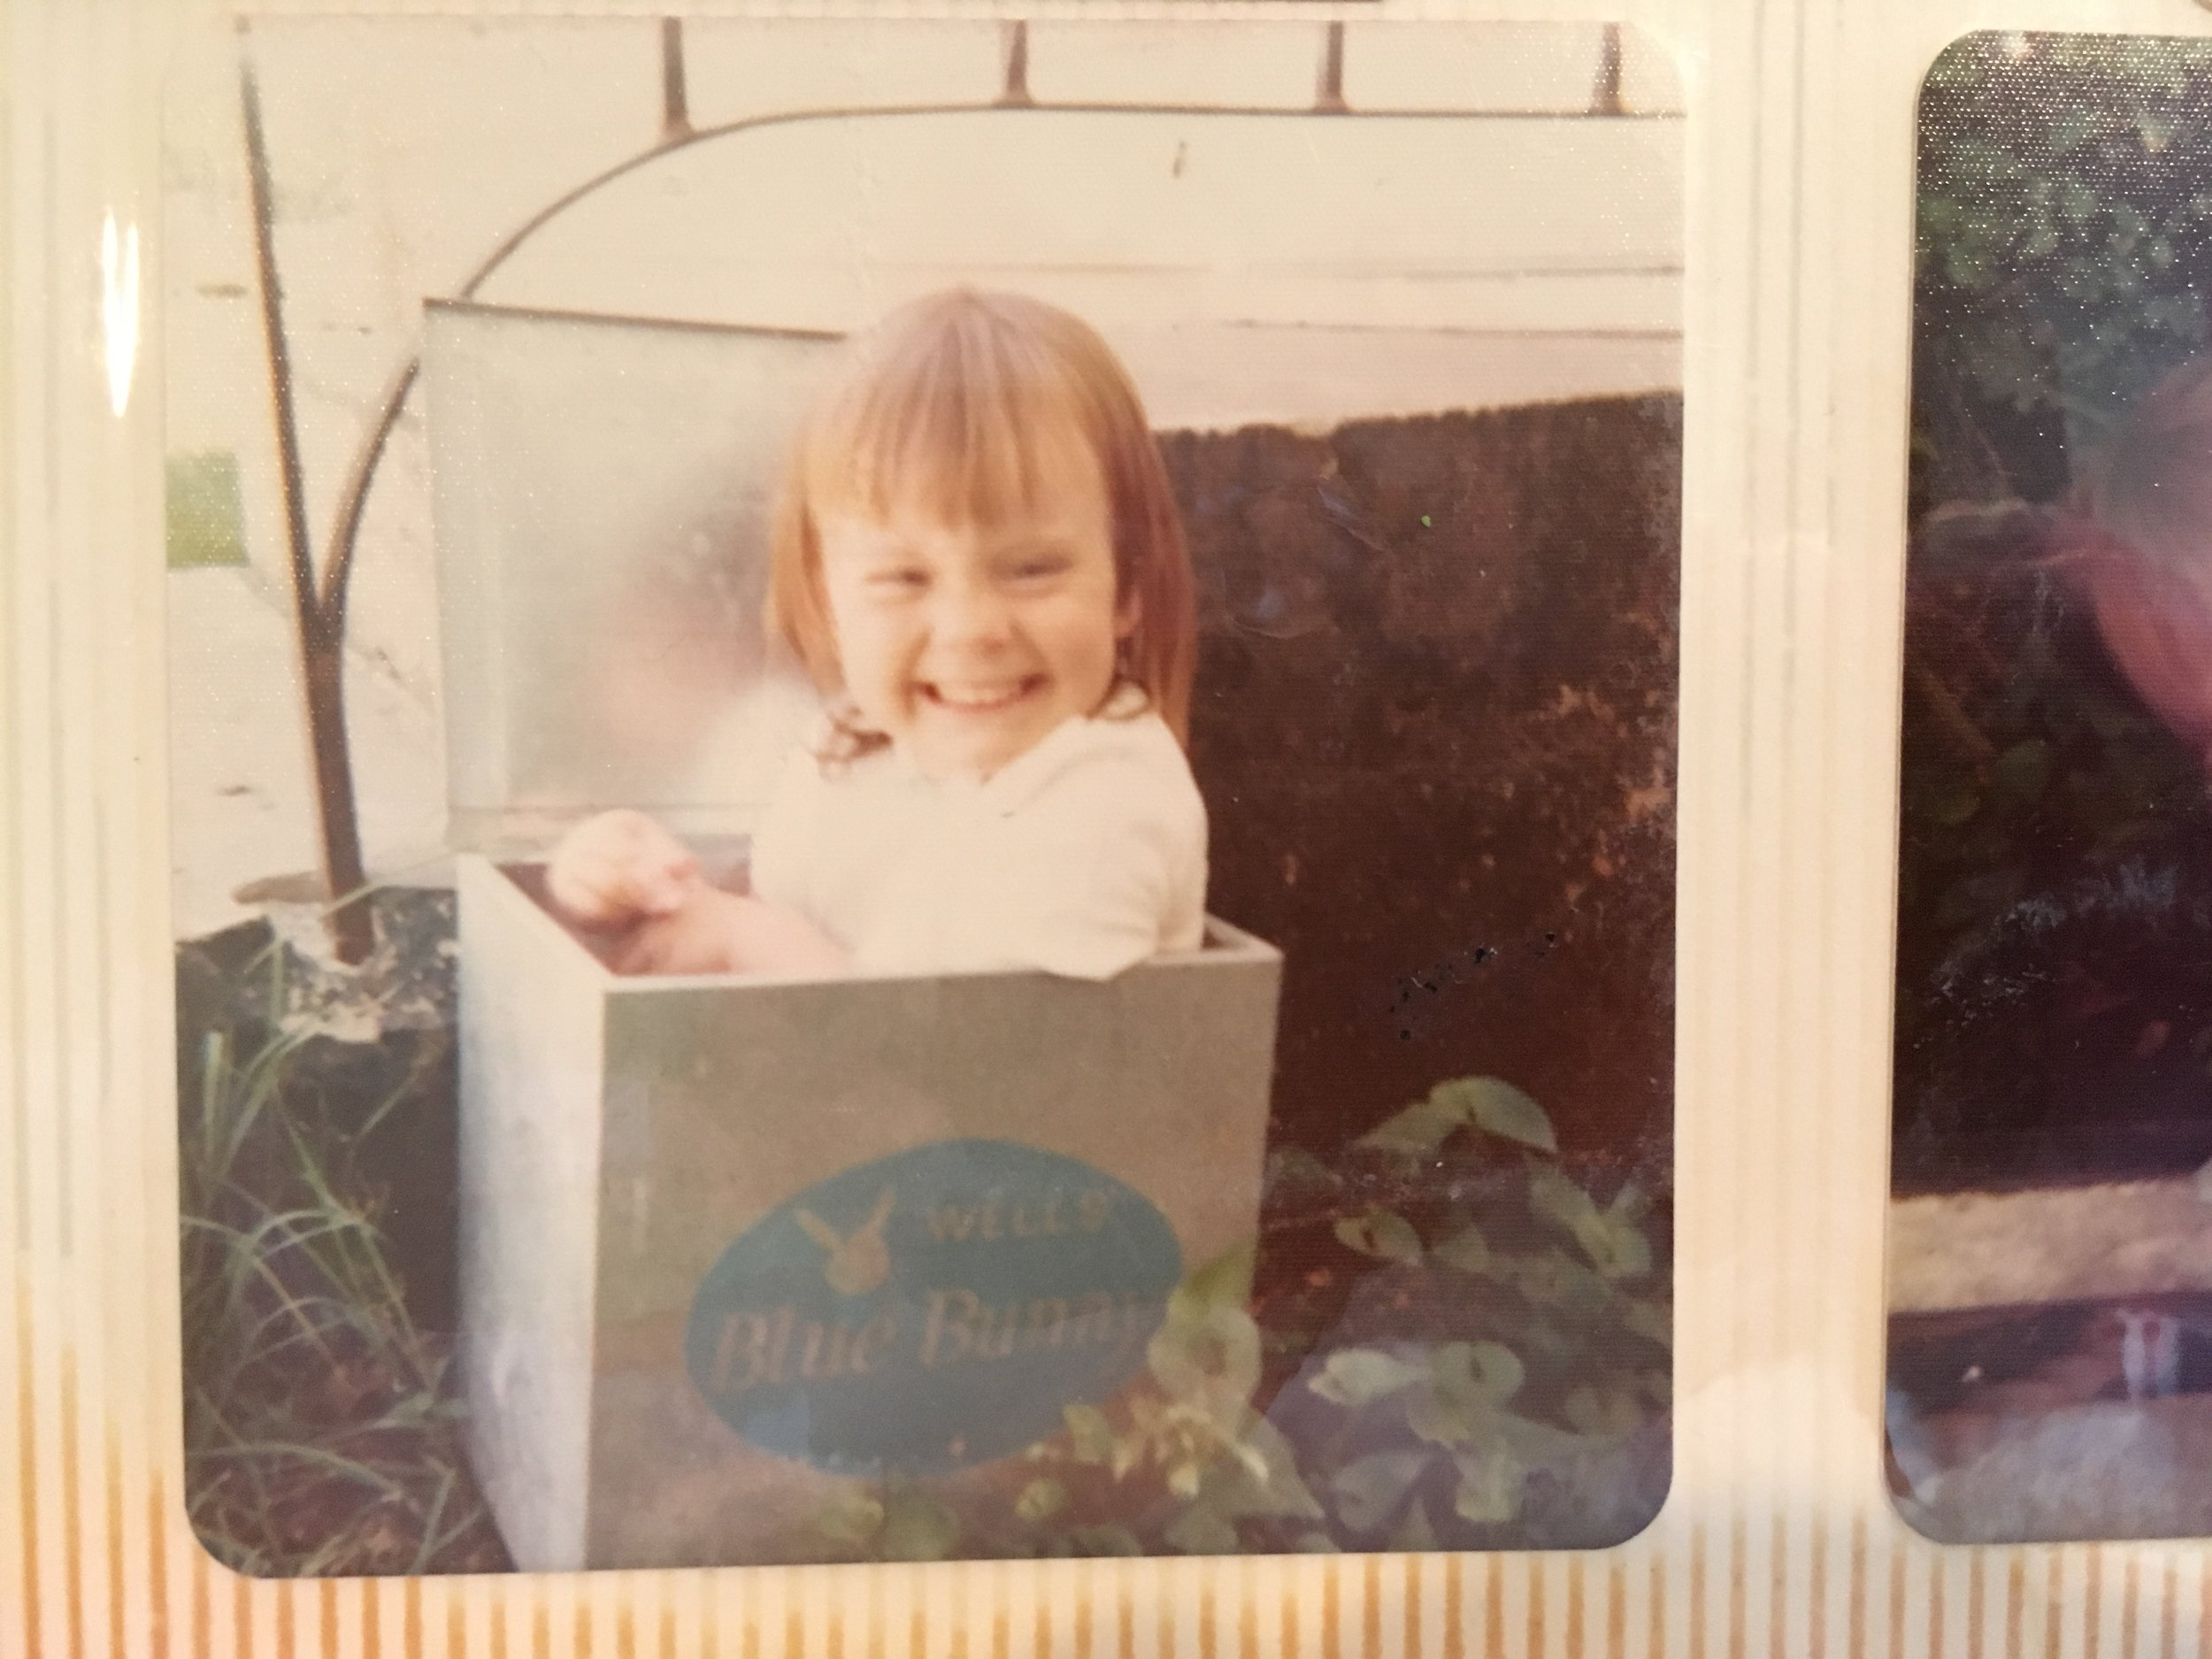 Me, fitting snugly into the milk box, circa 1973.